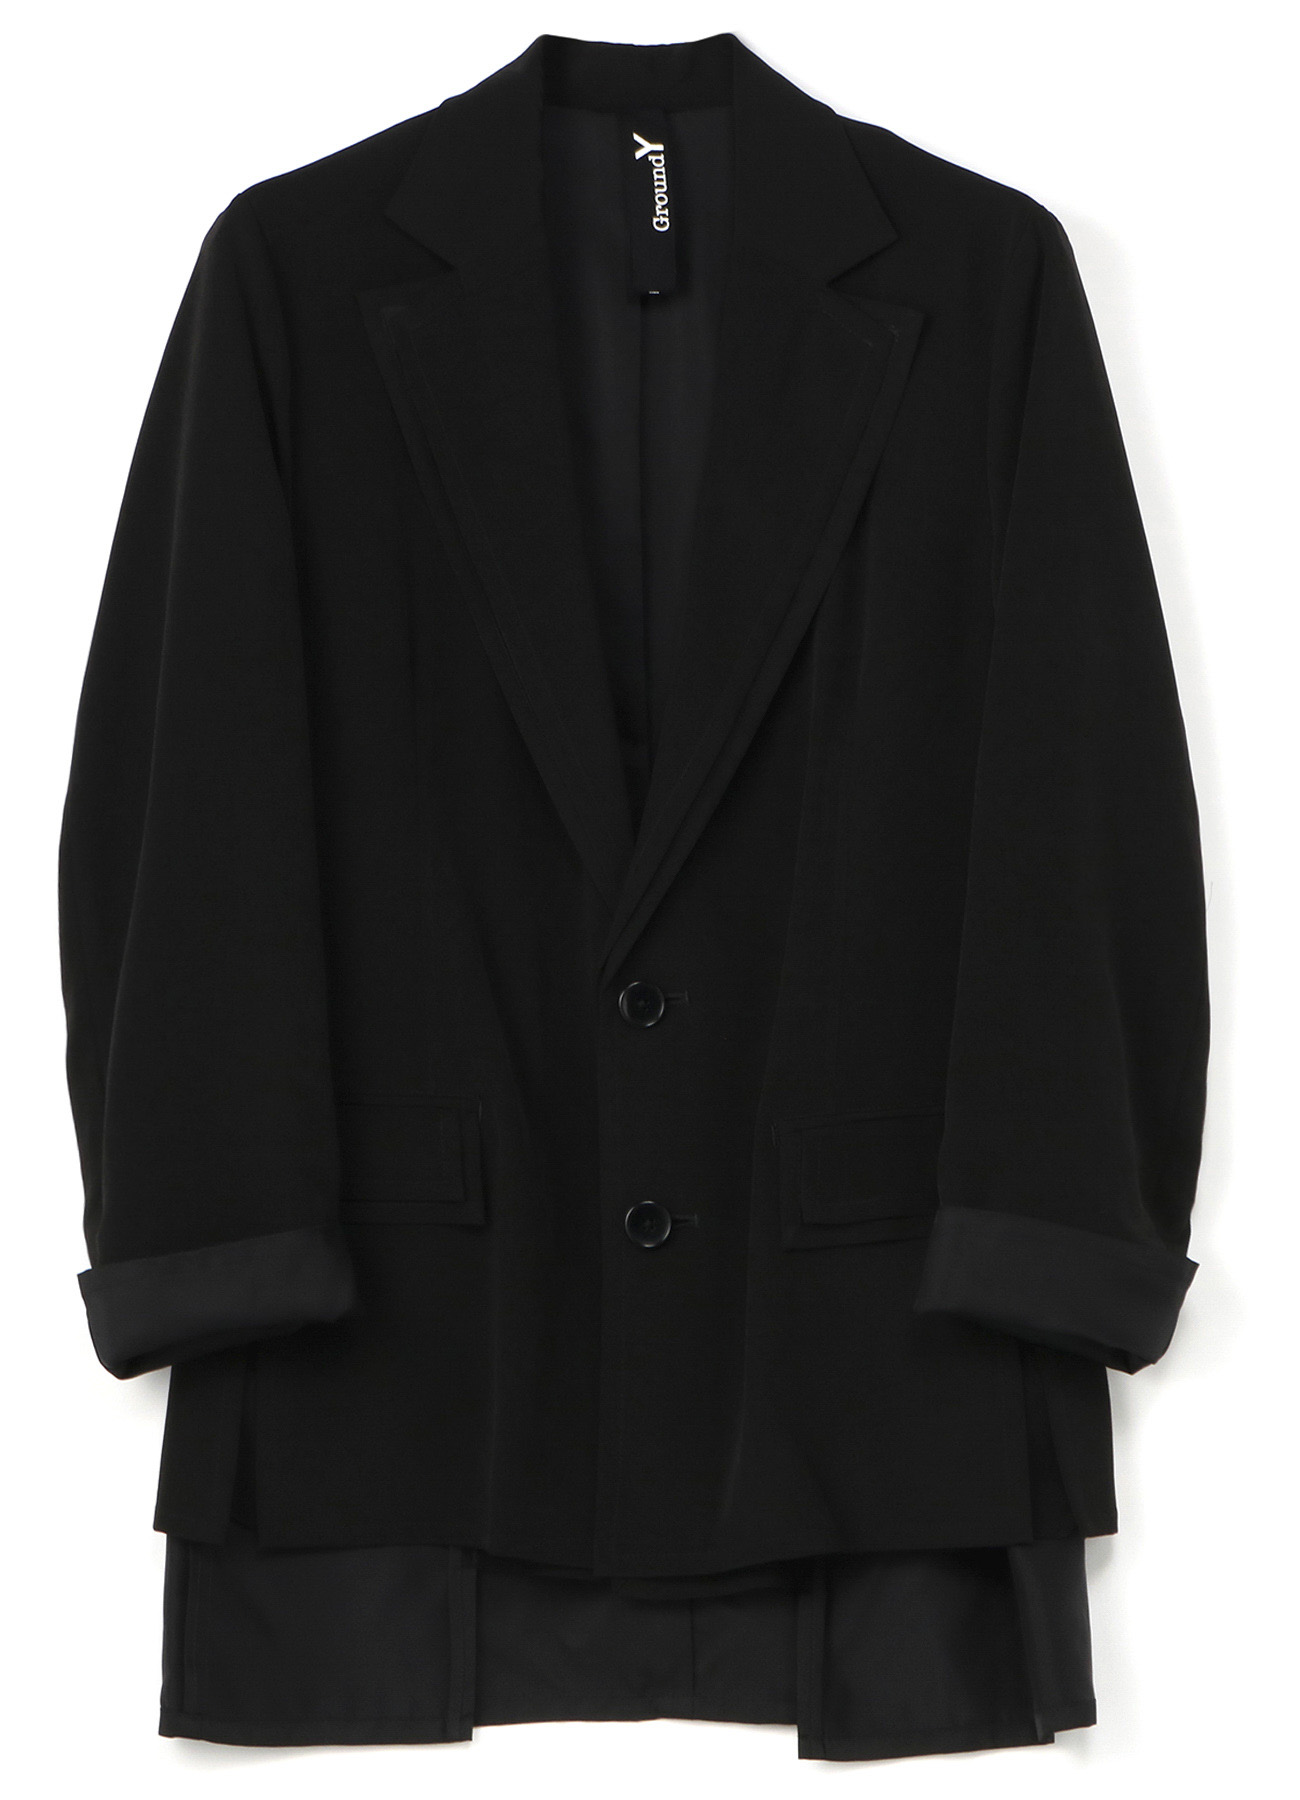 T/A vintage decyne Double Jacket